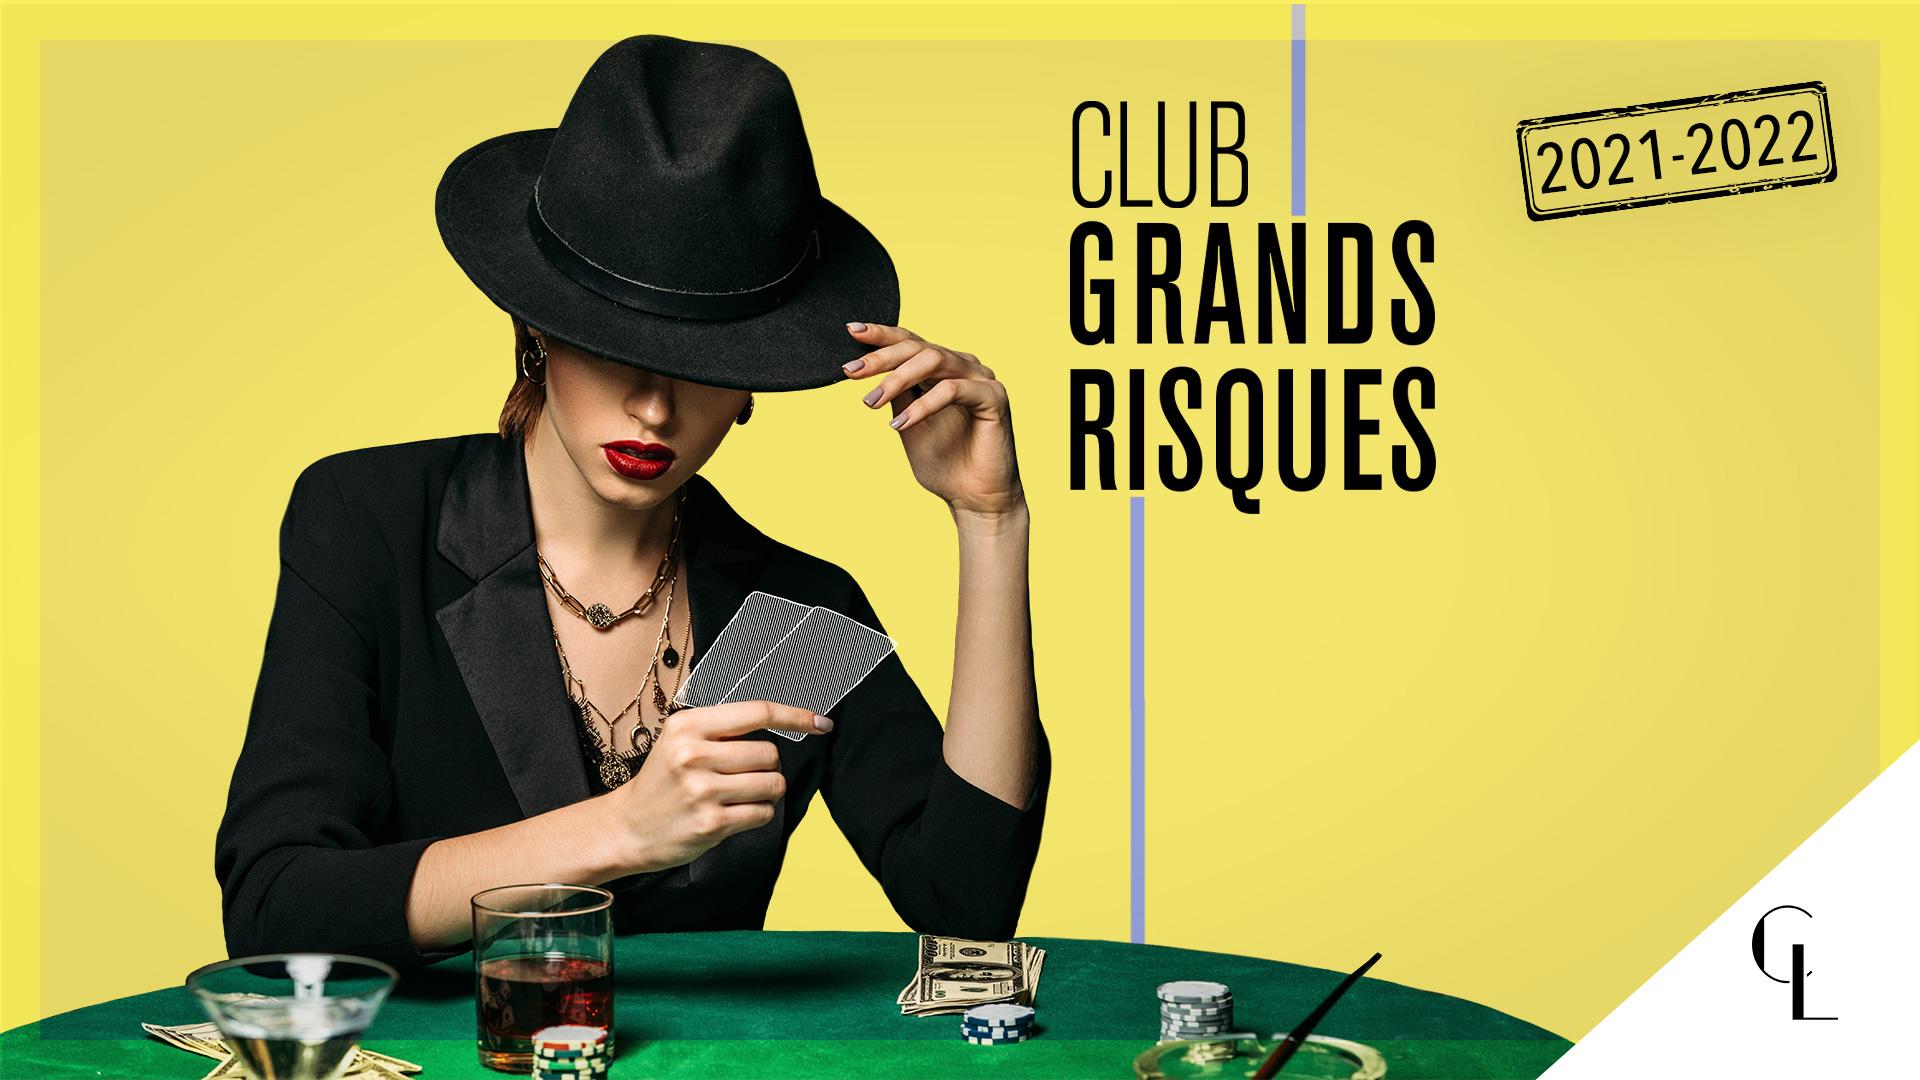 Club Grands Risques